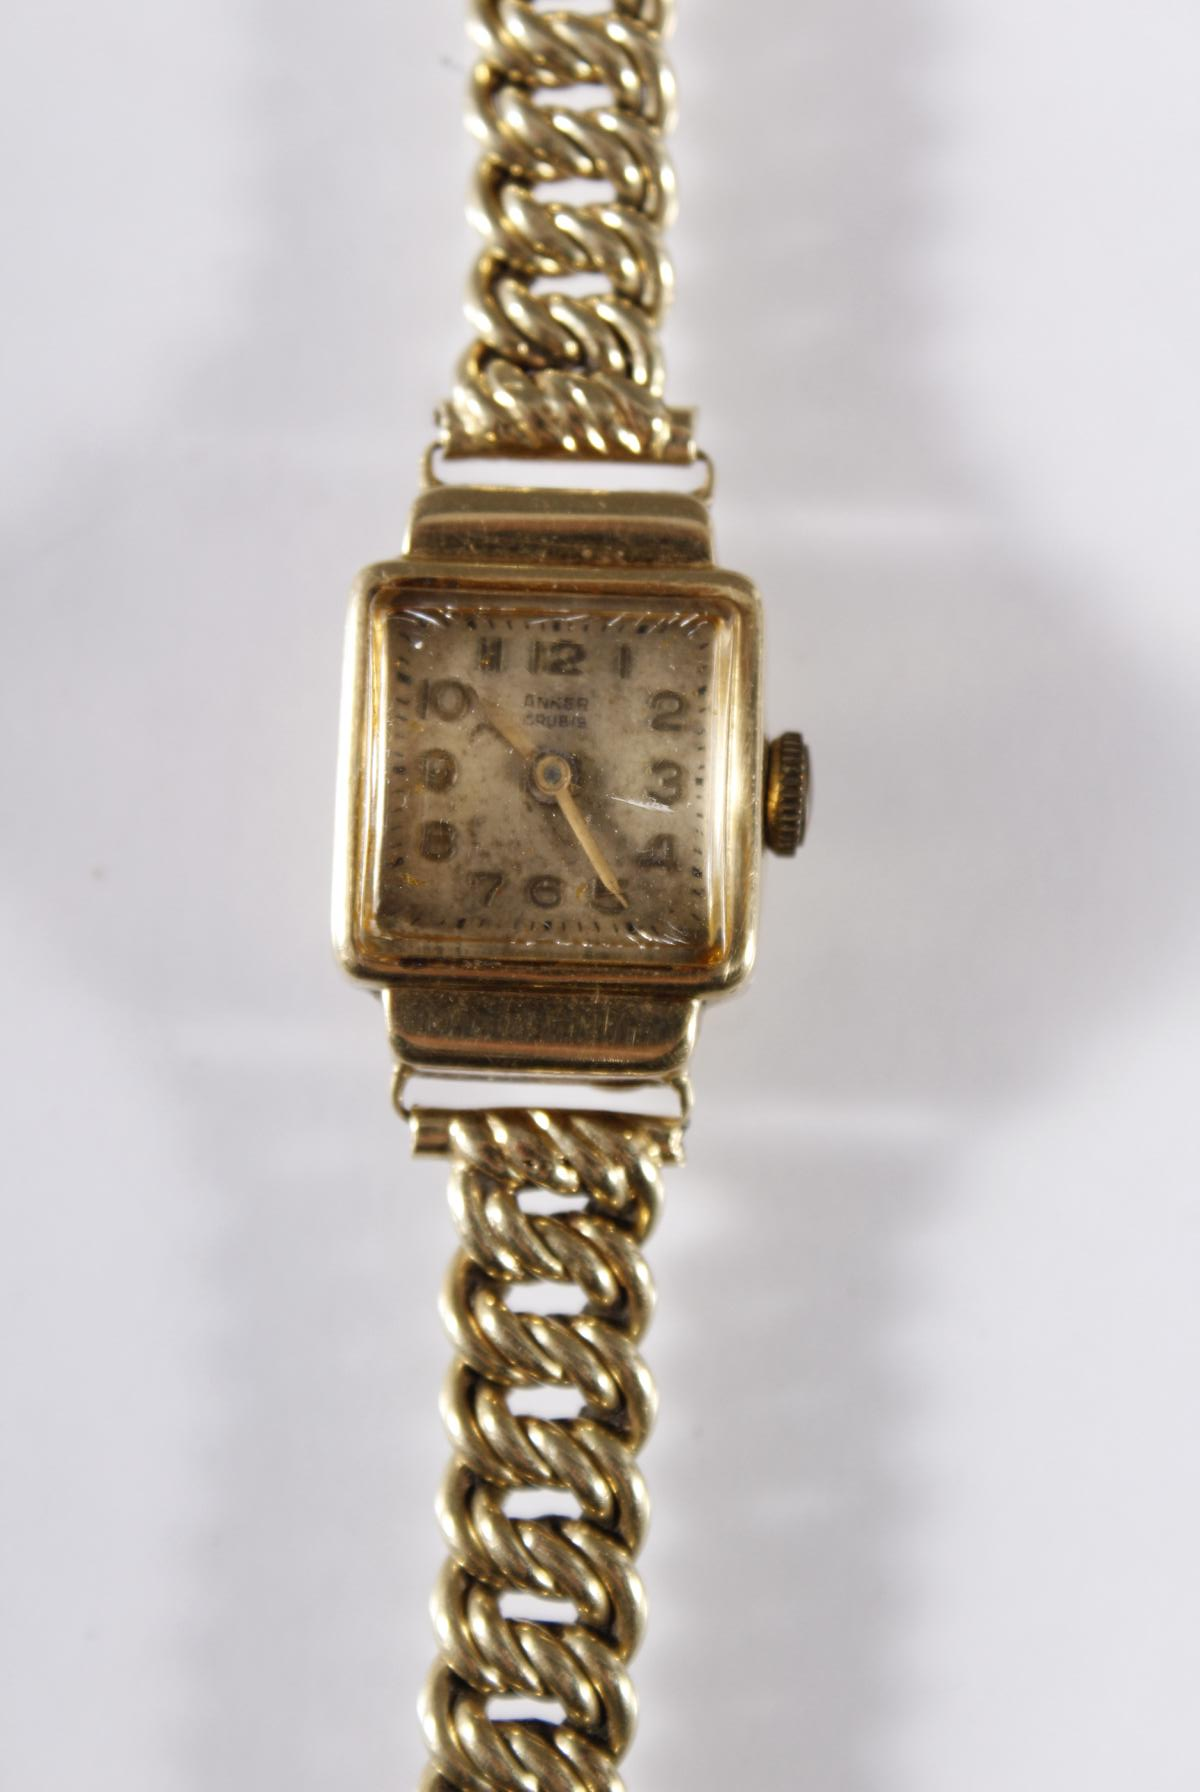 Damenarmbanduhr der Marke Anker, 14 Karat Gelbgold-2